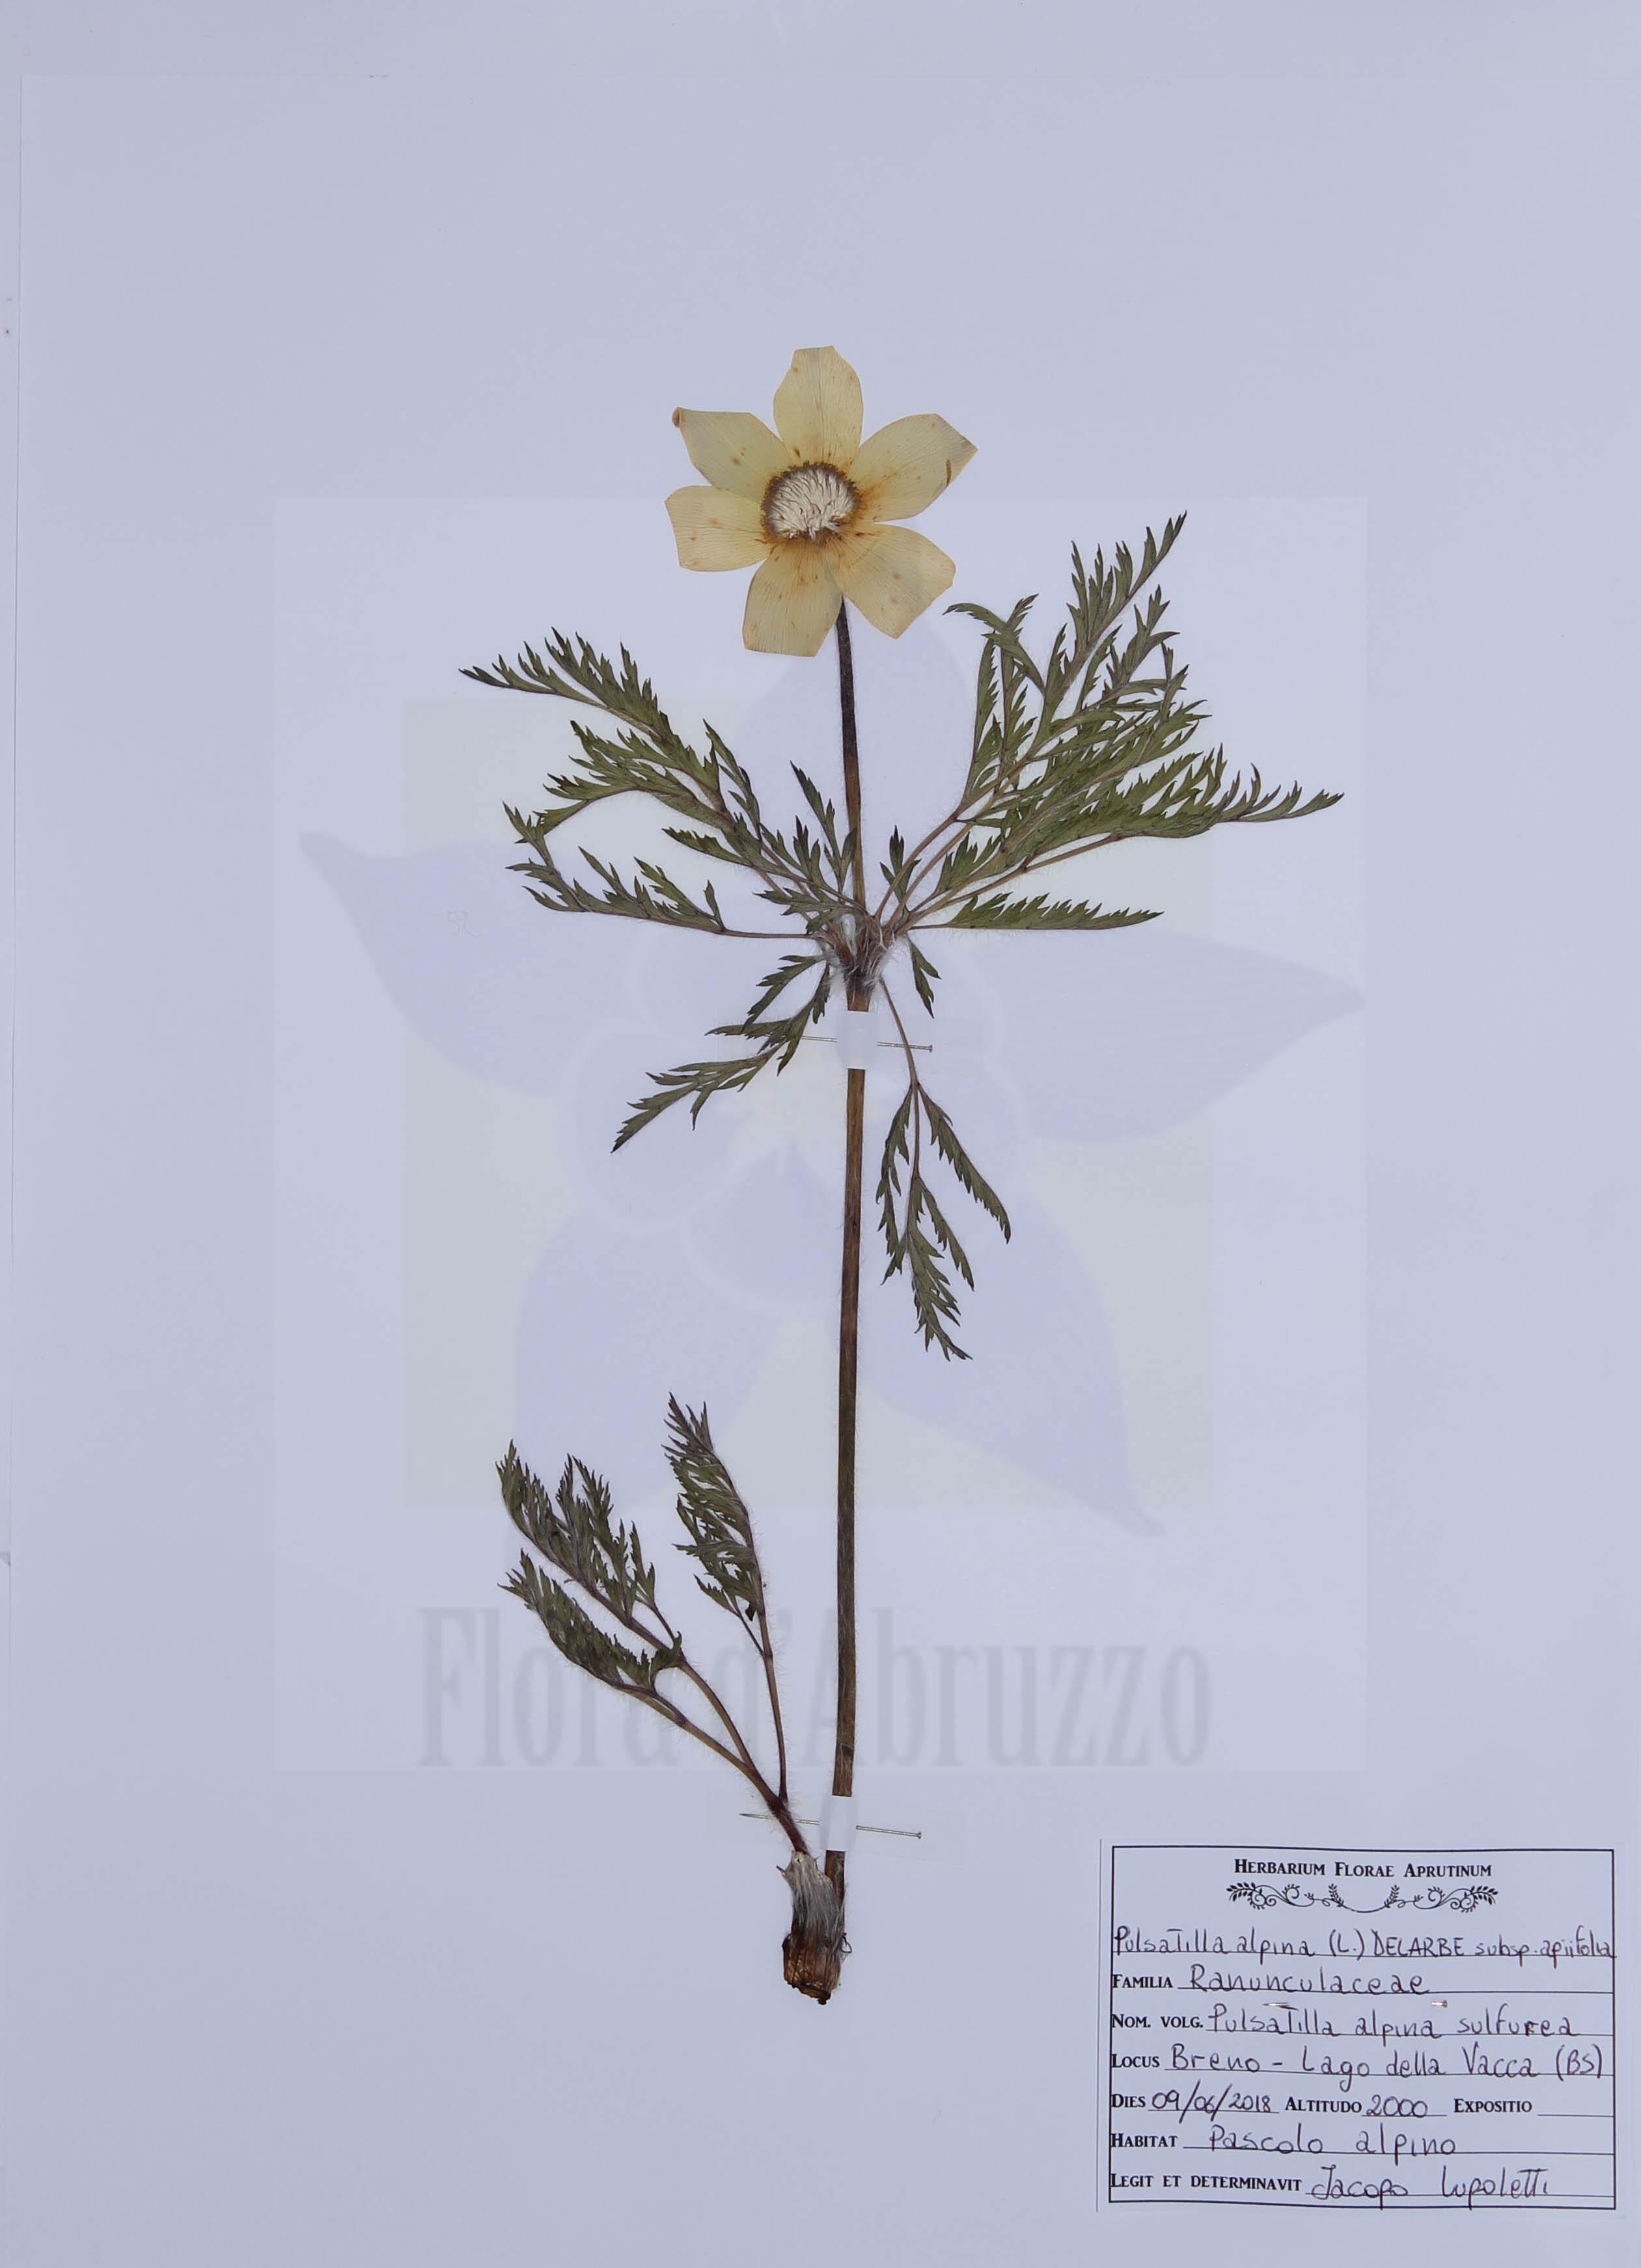 Pulsatilla alpina (L.) Delarbre subsp. apiifolia (Scop.) Nyman